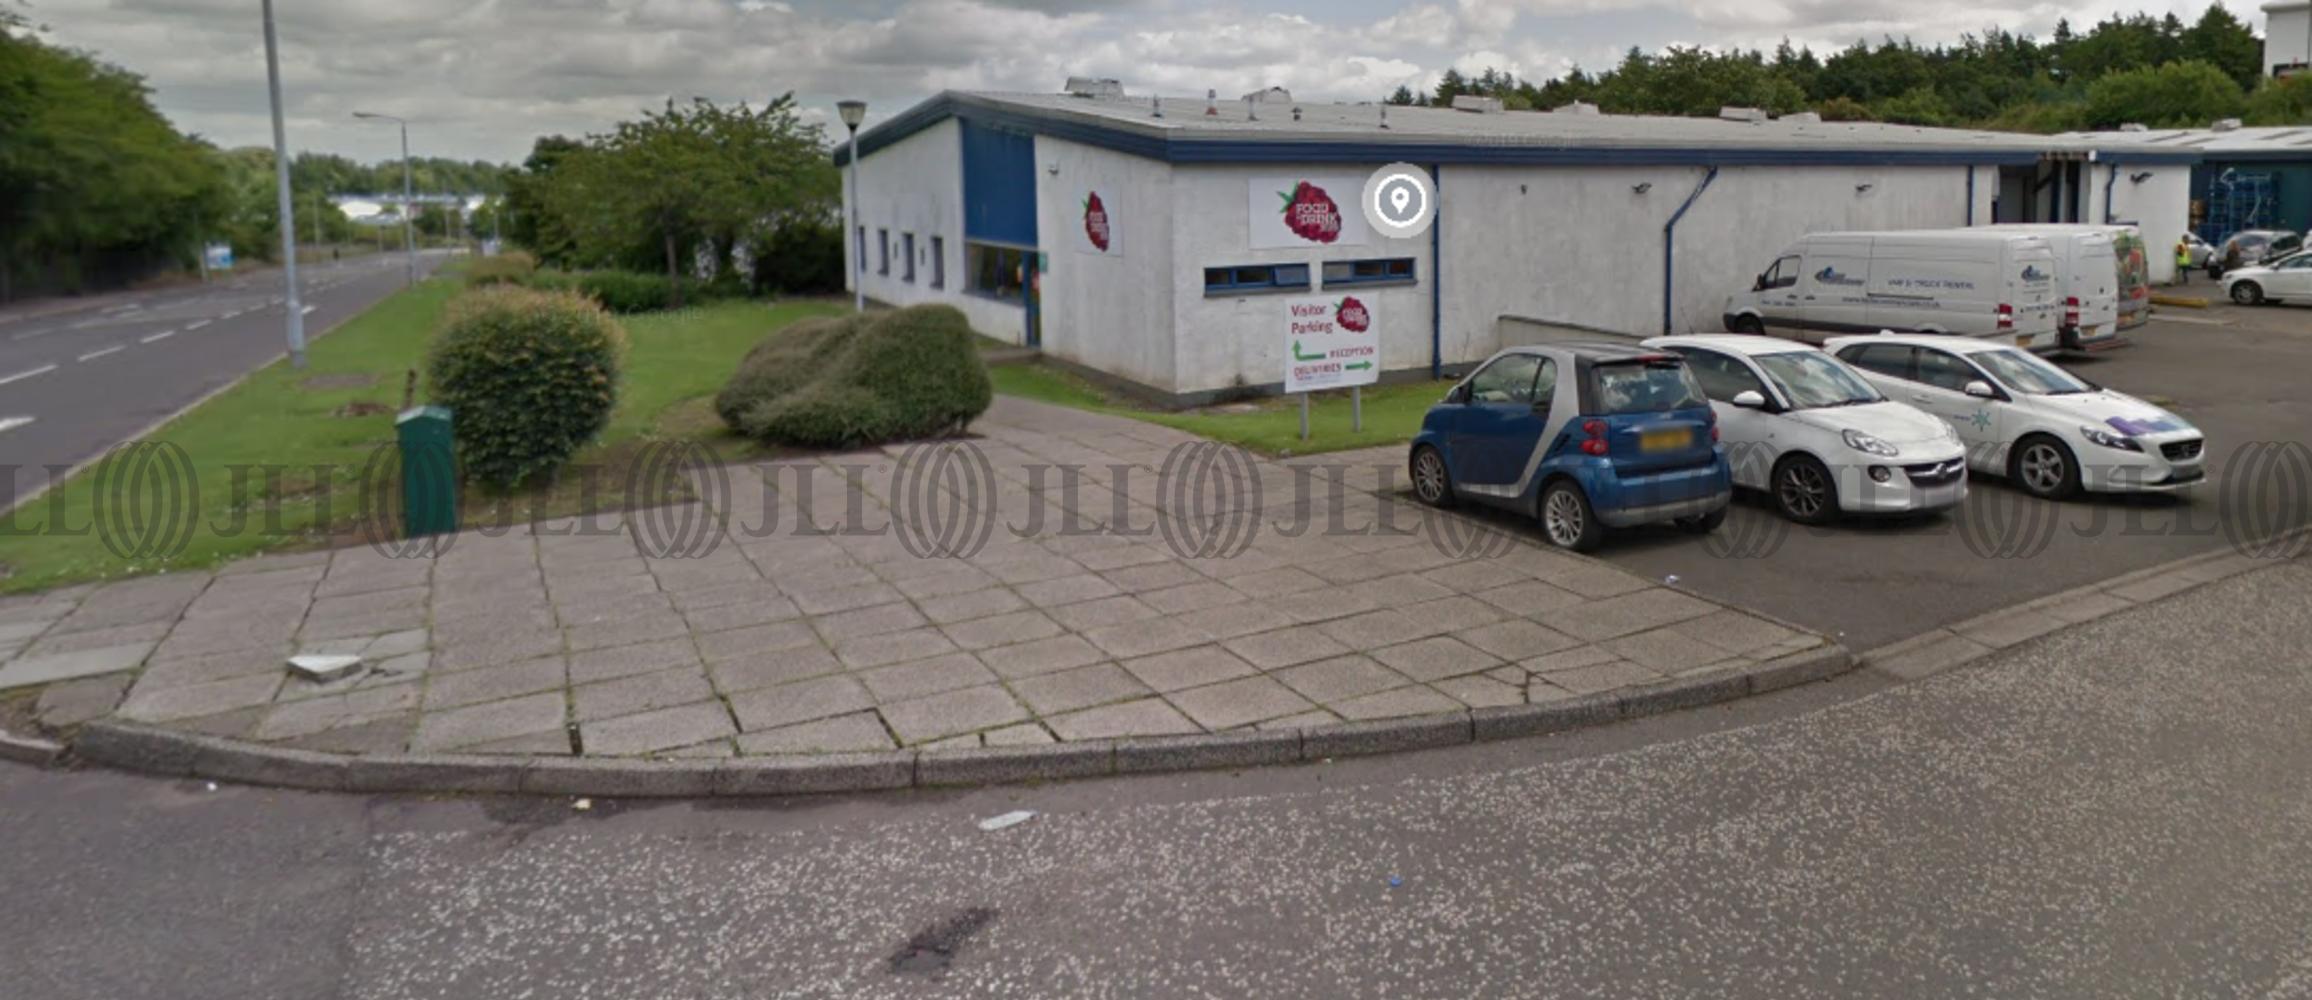 Industrial Cumbernauld, G68 0EF - 59 Napier Road